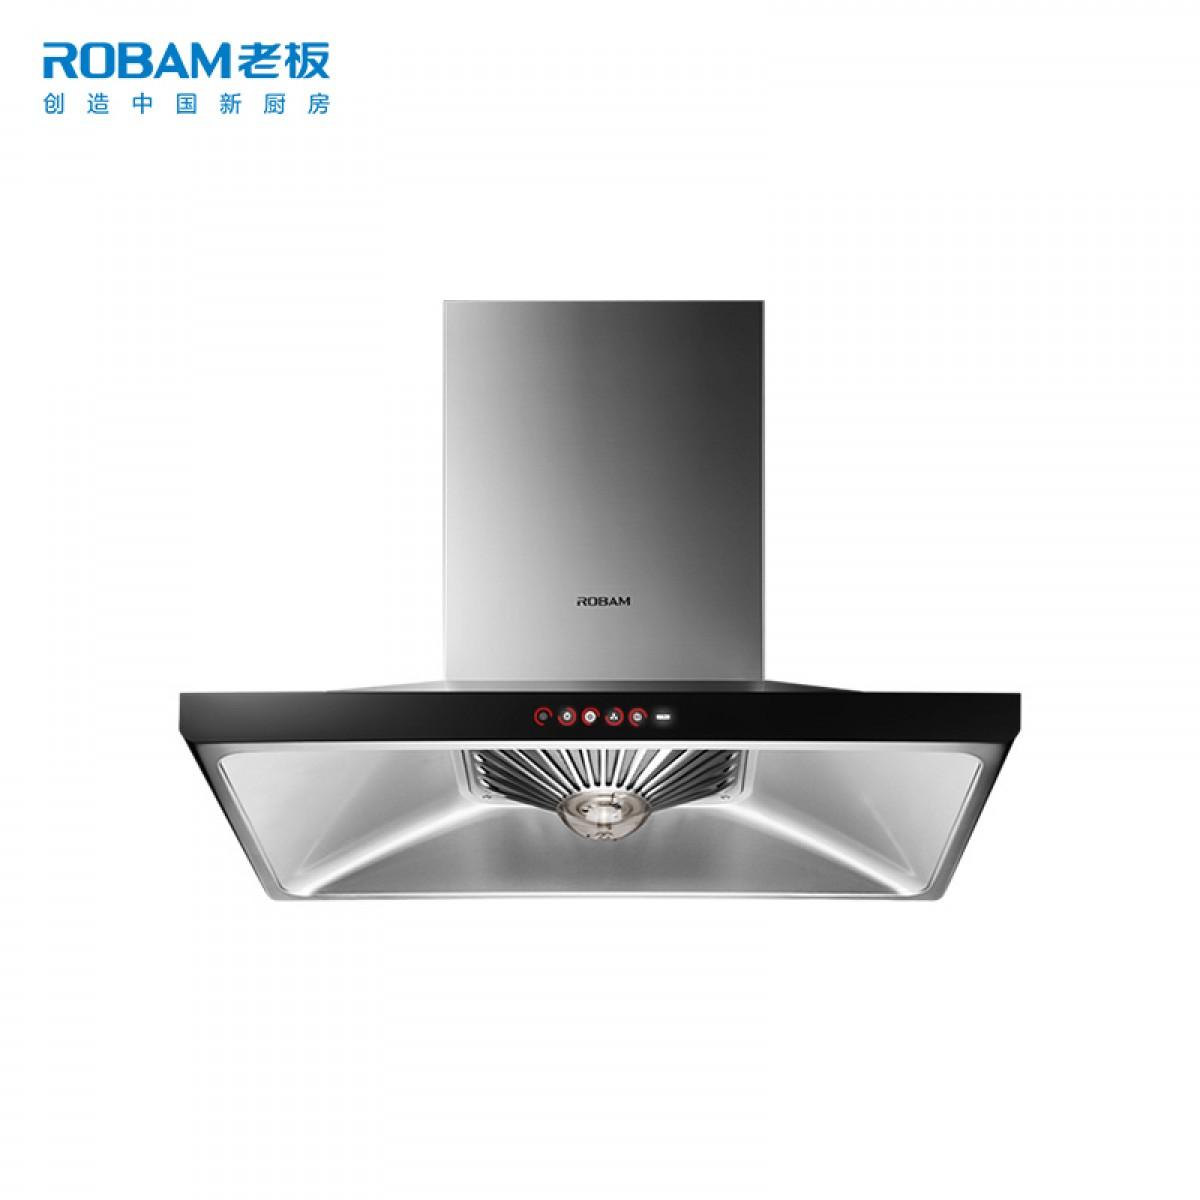 Robam/老板 CXW-220-66A2H老板牌油烟机电器家用66A2H欧式顶吸大